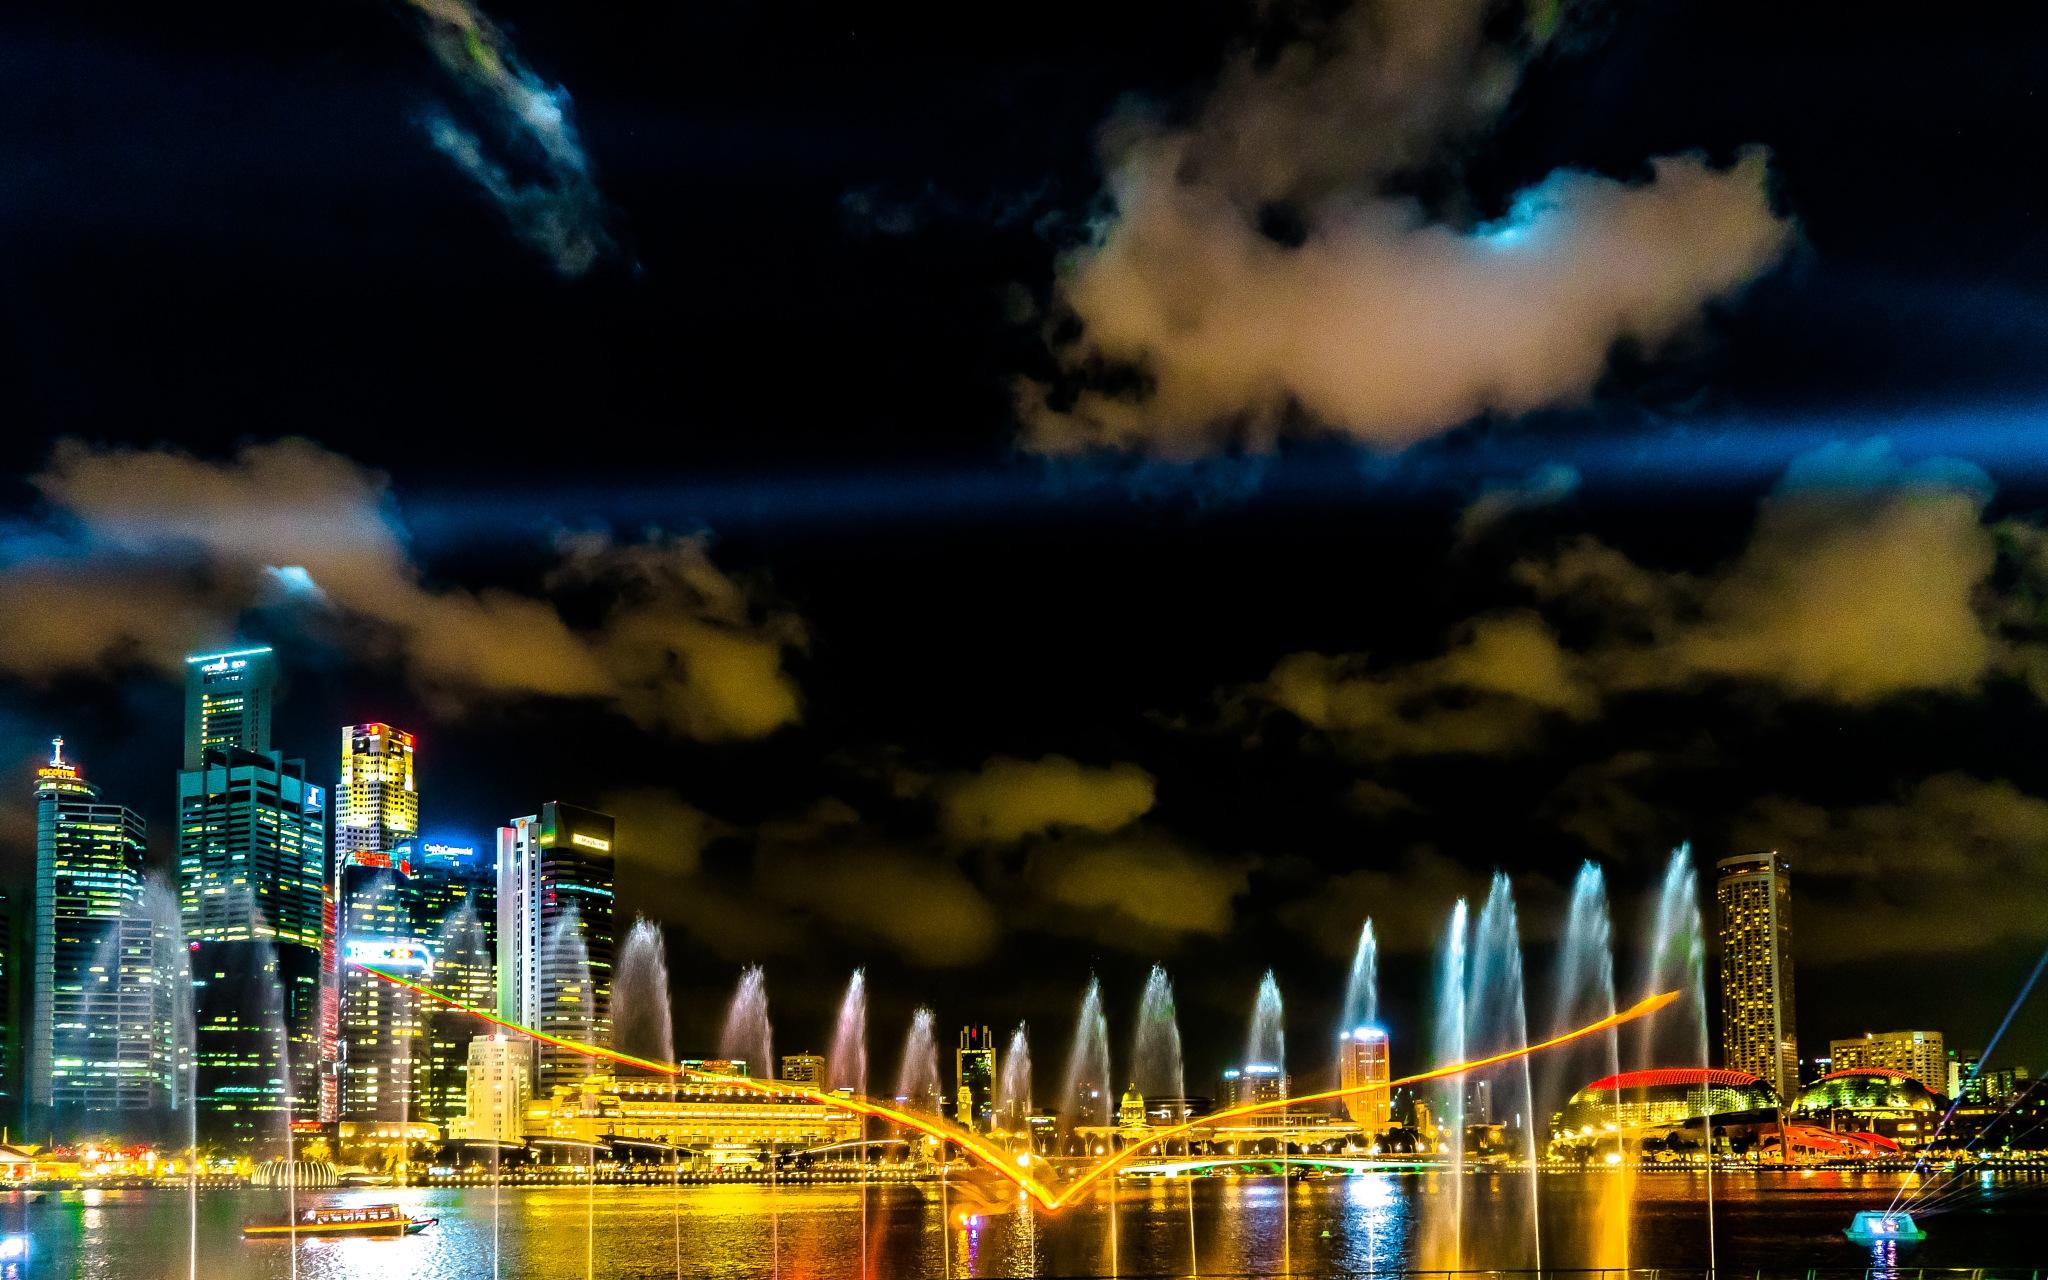 Singapore light show II by BernArt Photography